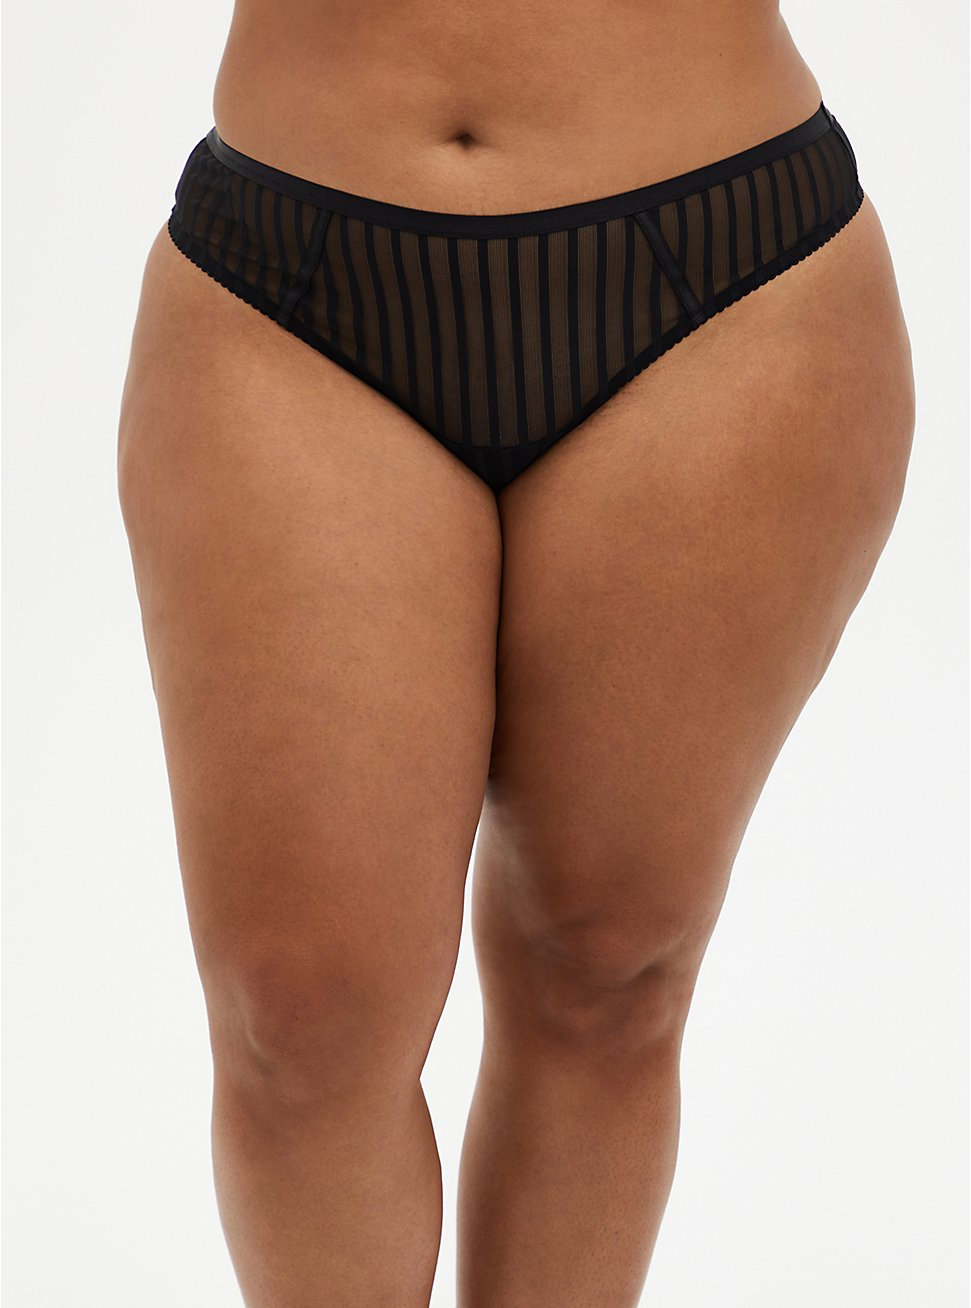 Black Striped Mesh Cut Out Thong Panty, RICH BLACK, hi-res